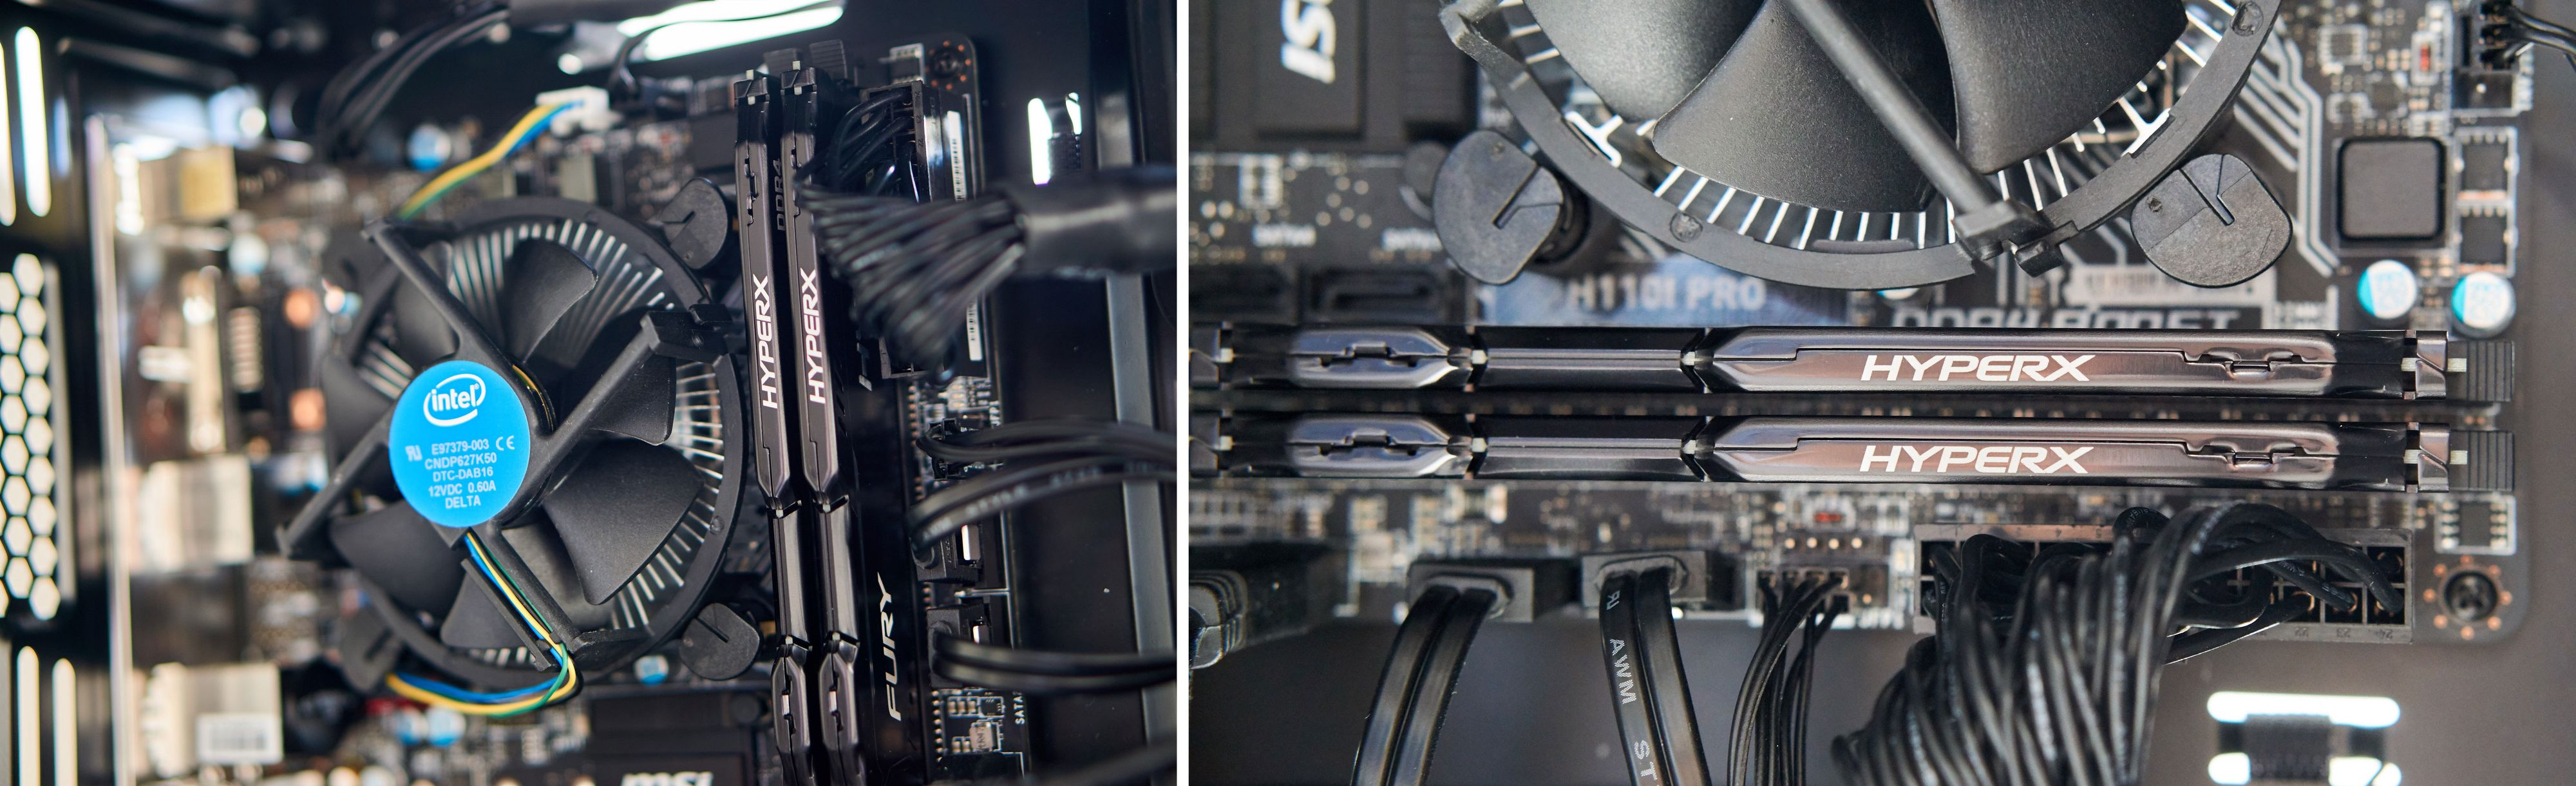 En Intel Core i5-6600 i tospann med 16 GB DDR4-minne fra HyperX driver maskinen.